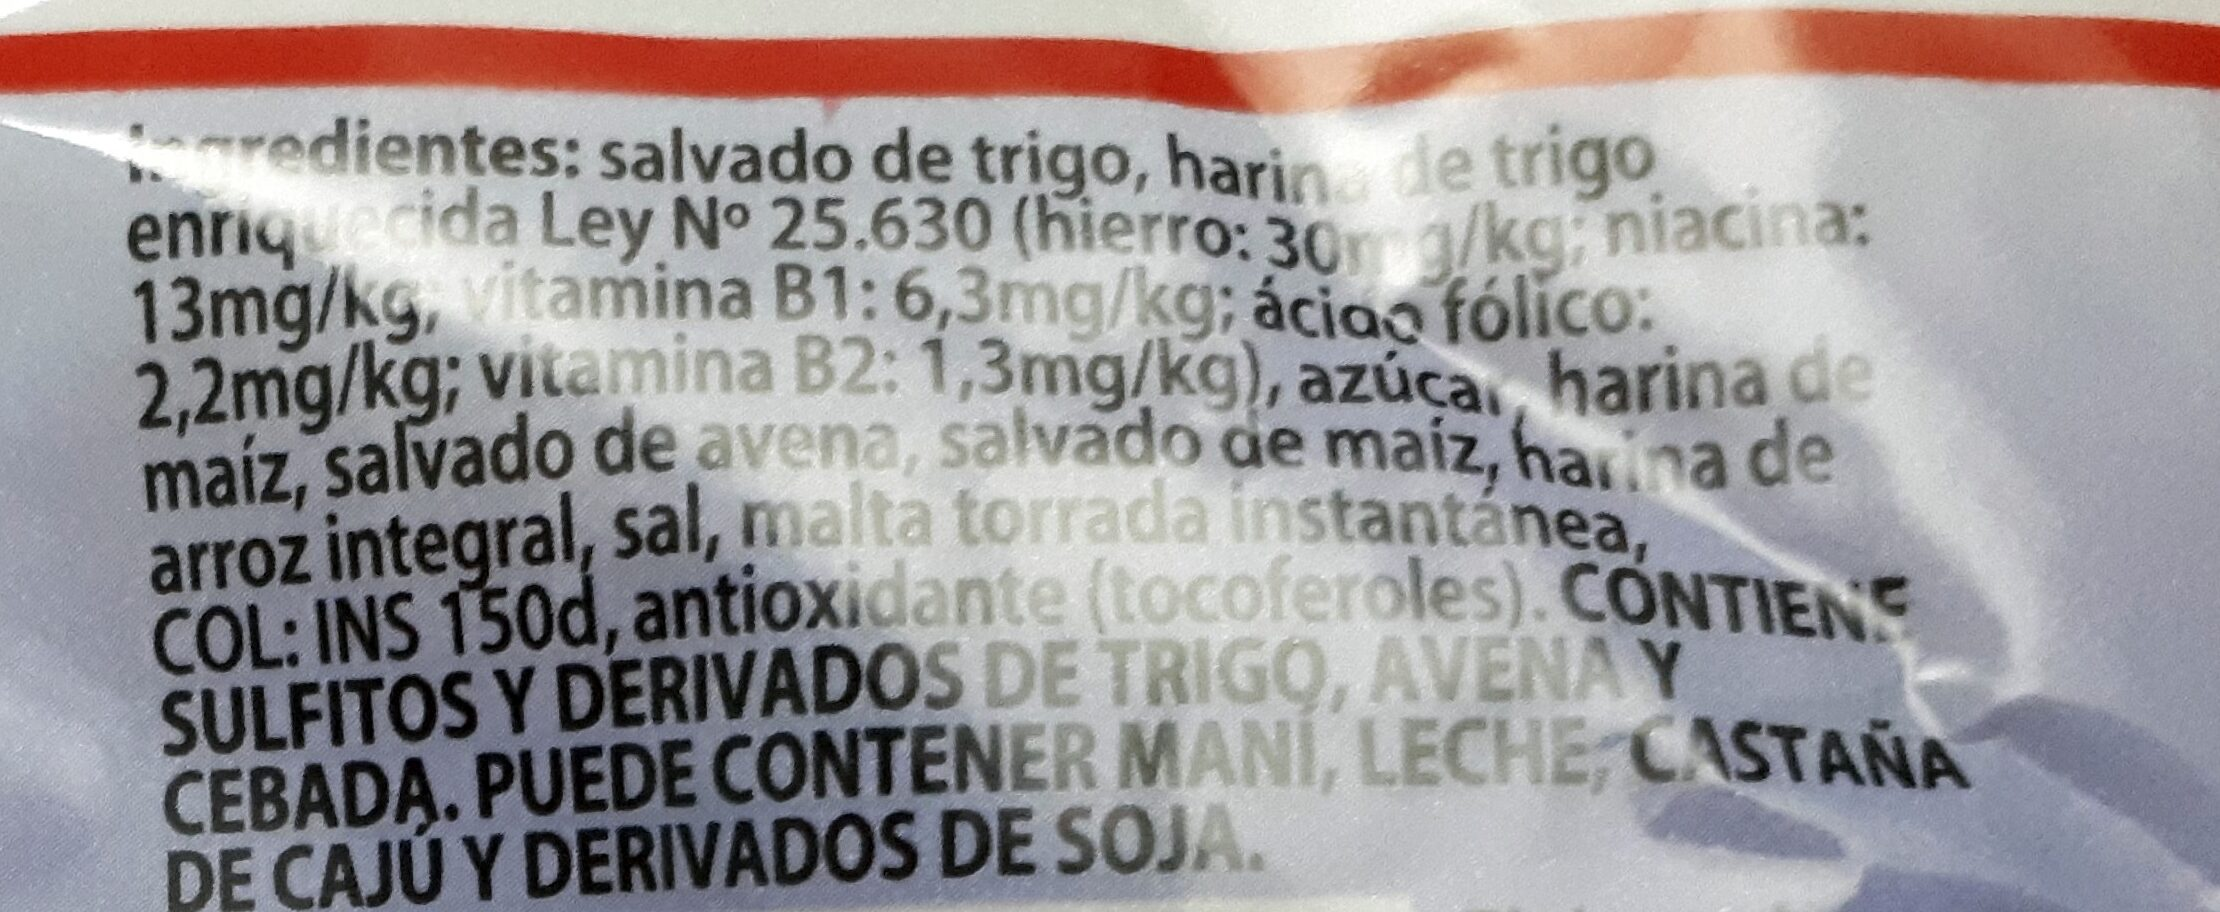 Fibra Total 4 Fibras - Ingredients - es